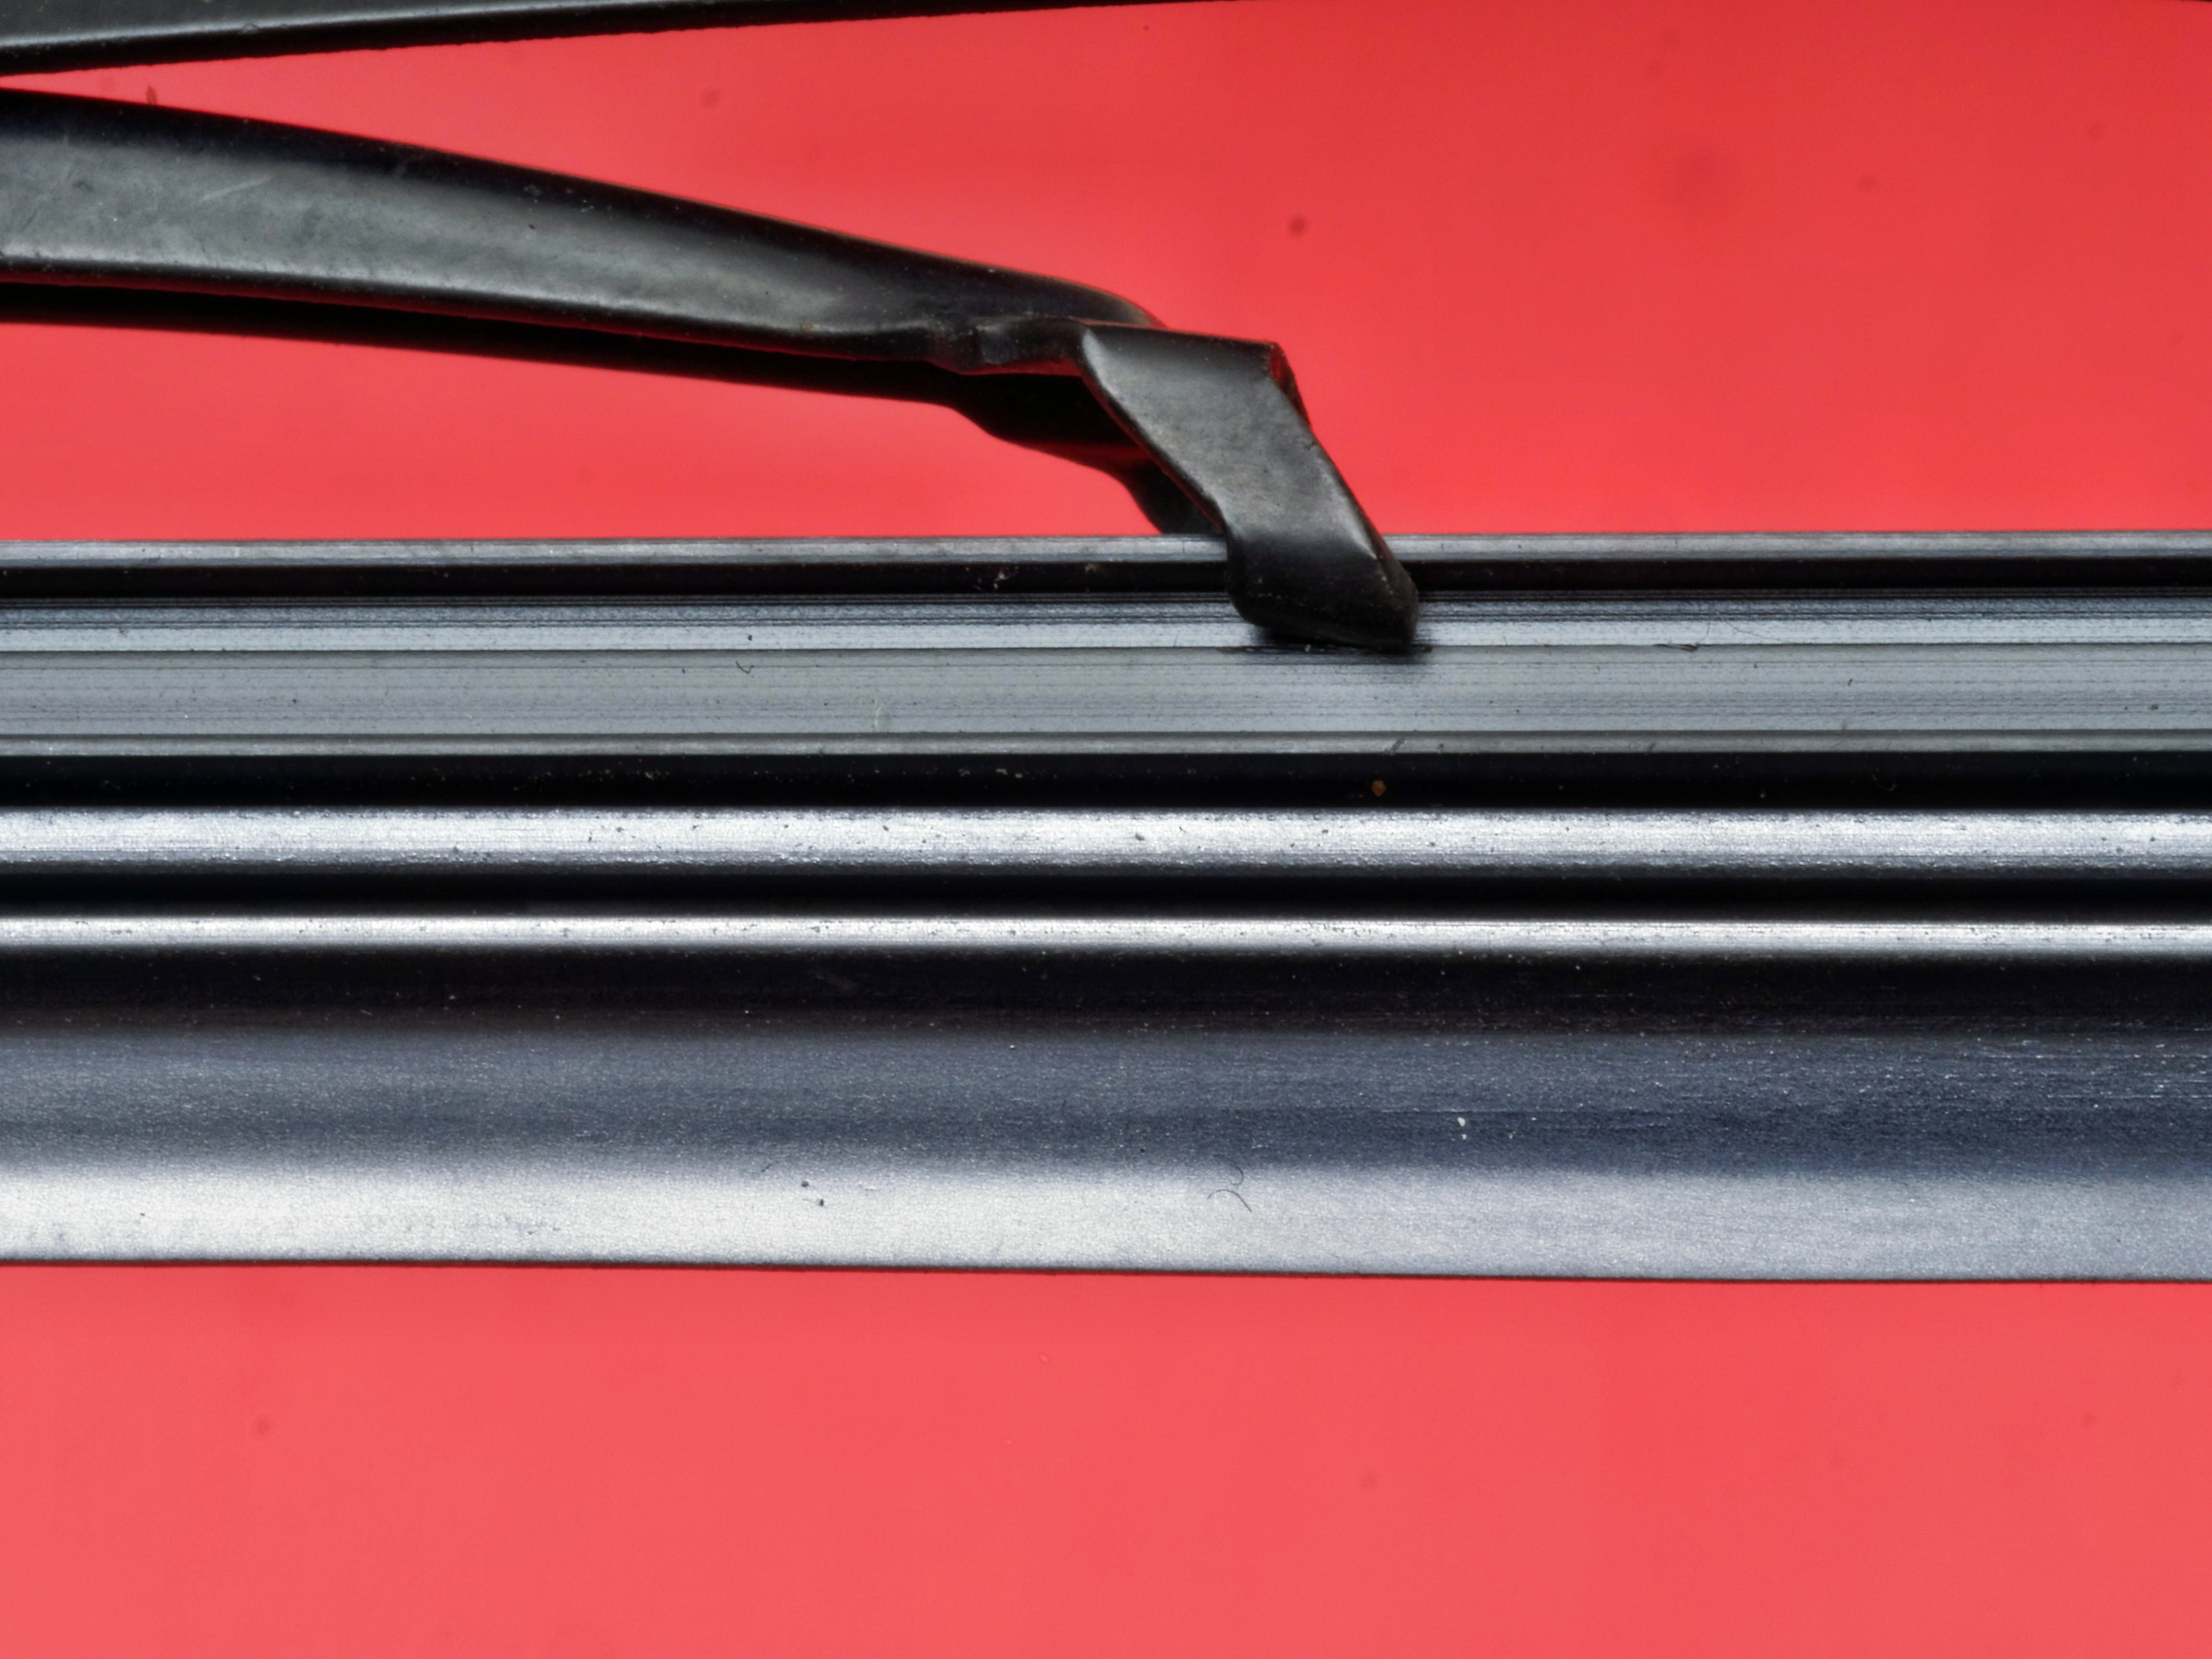 Wiper-blade-20.jpeg